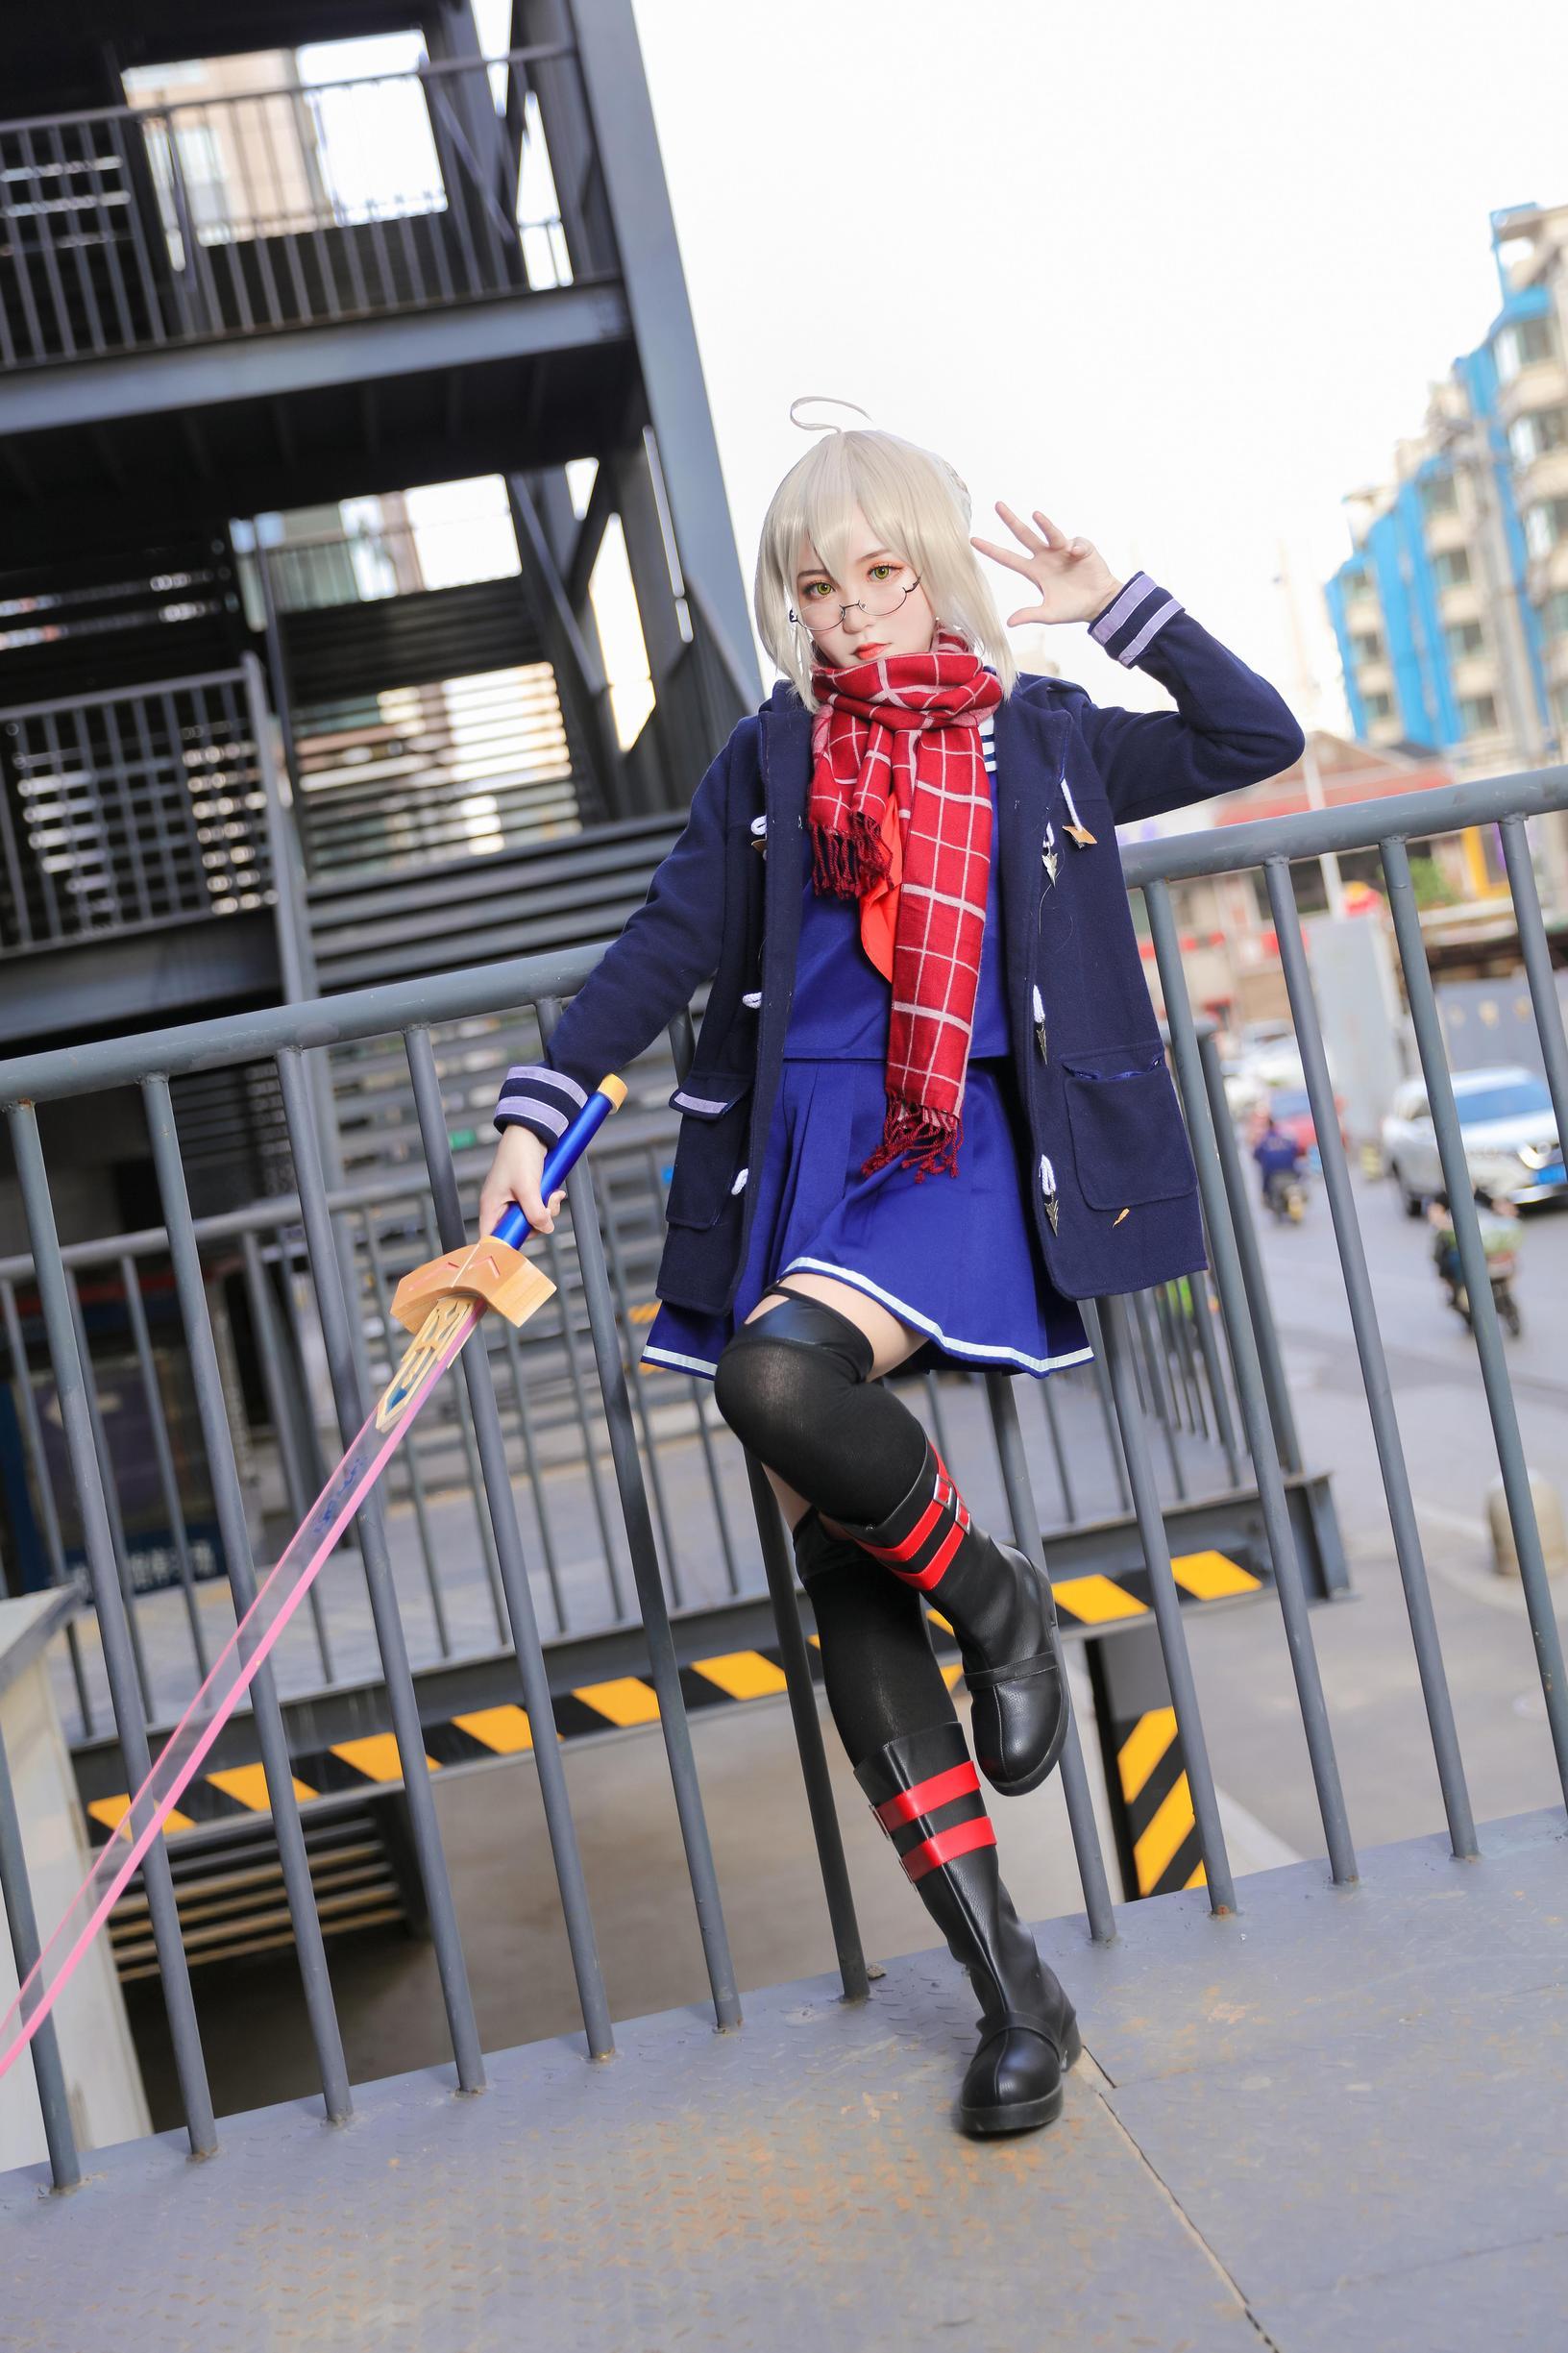 《FATE/GRAND ORDER》正片cosplay【CN:泡泡_咖啡因成瘾患者】 -cosplay丝袜图片短裙插图